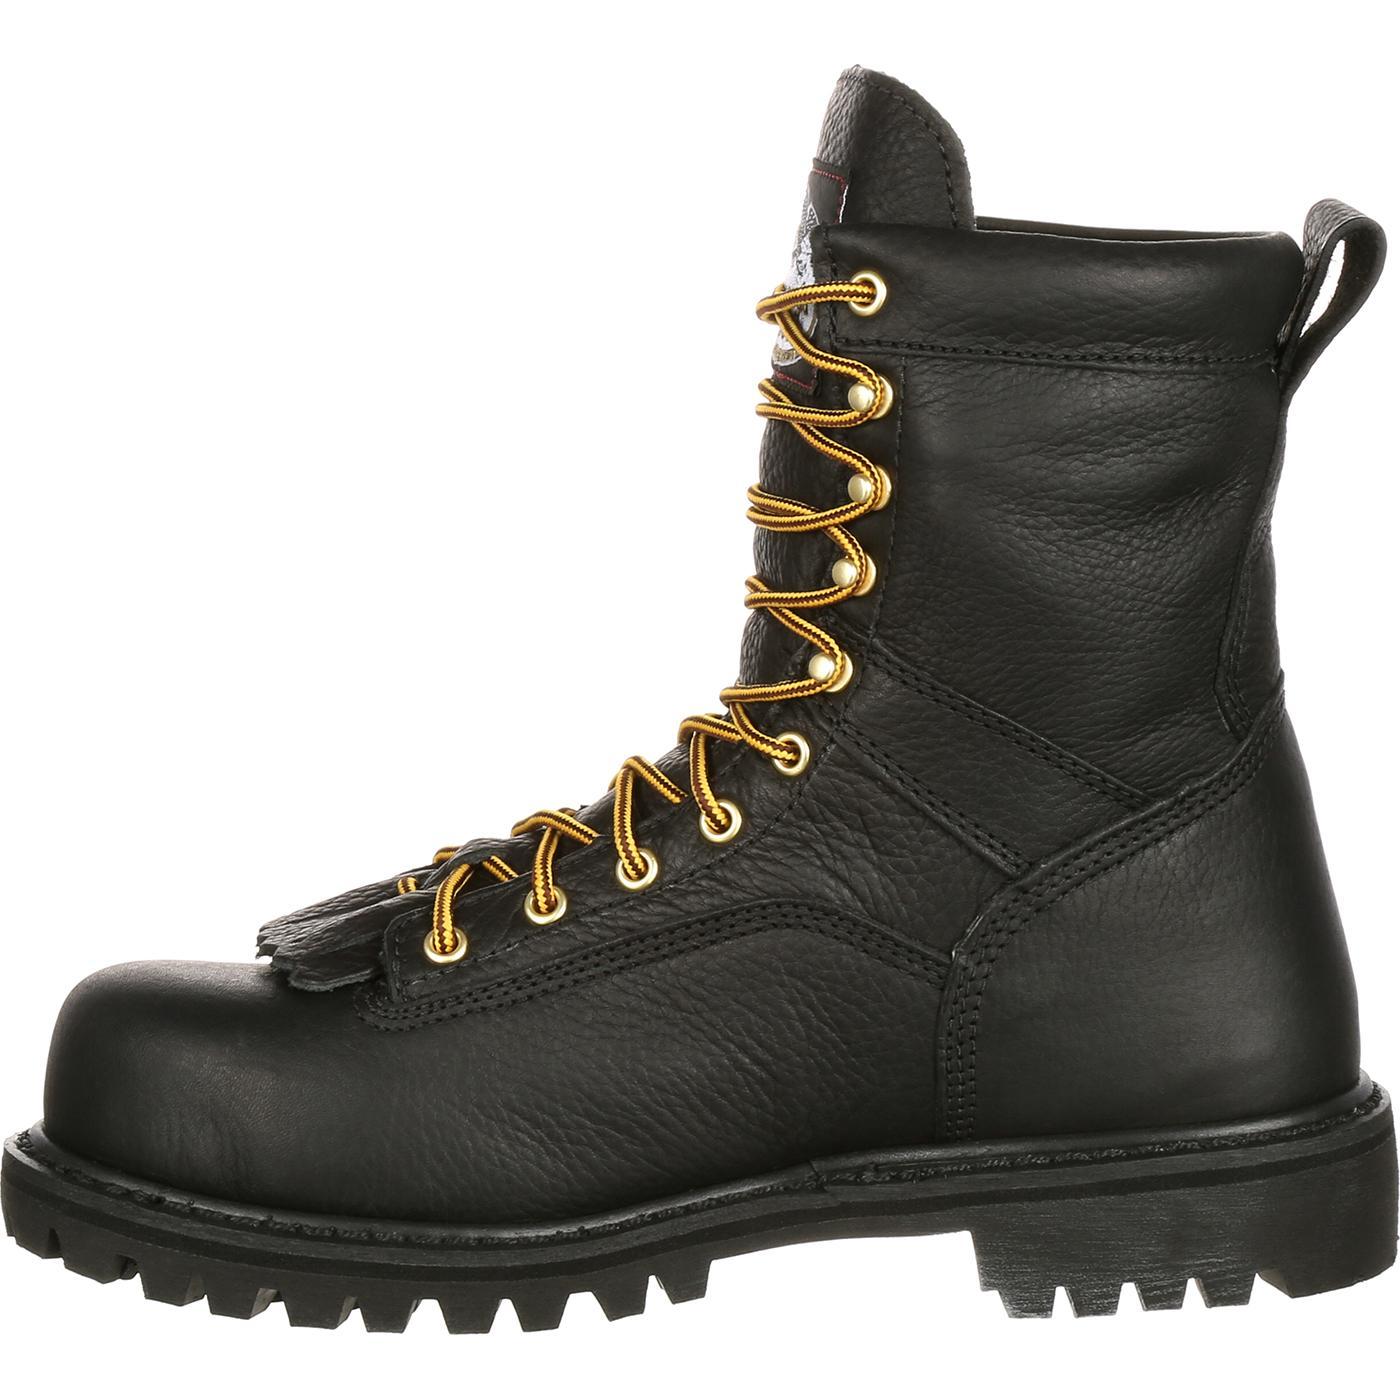 Men's Georgia Boot G8010 Low-Heel Logger, Size: 12 M, Black